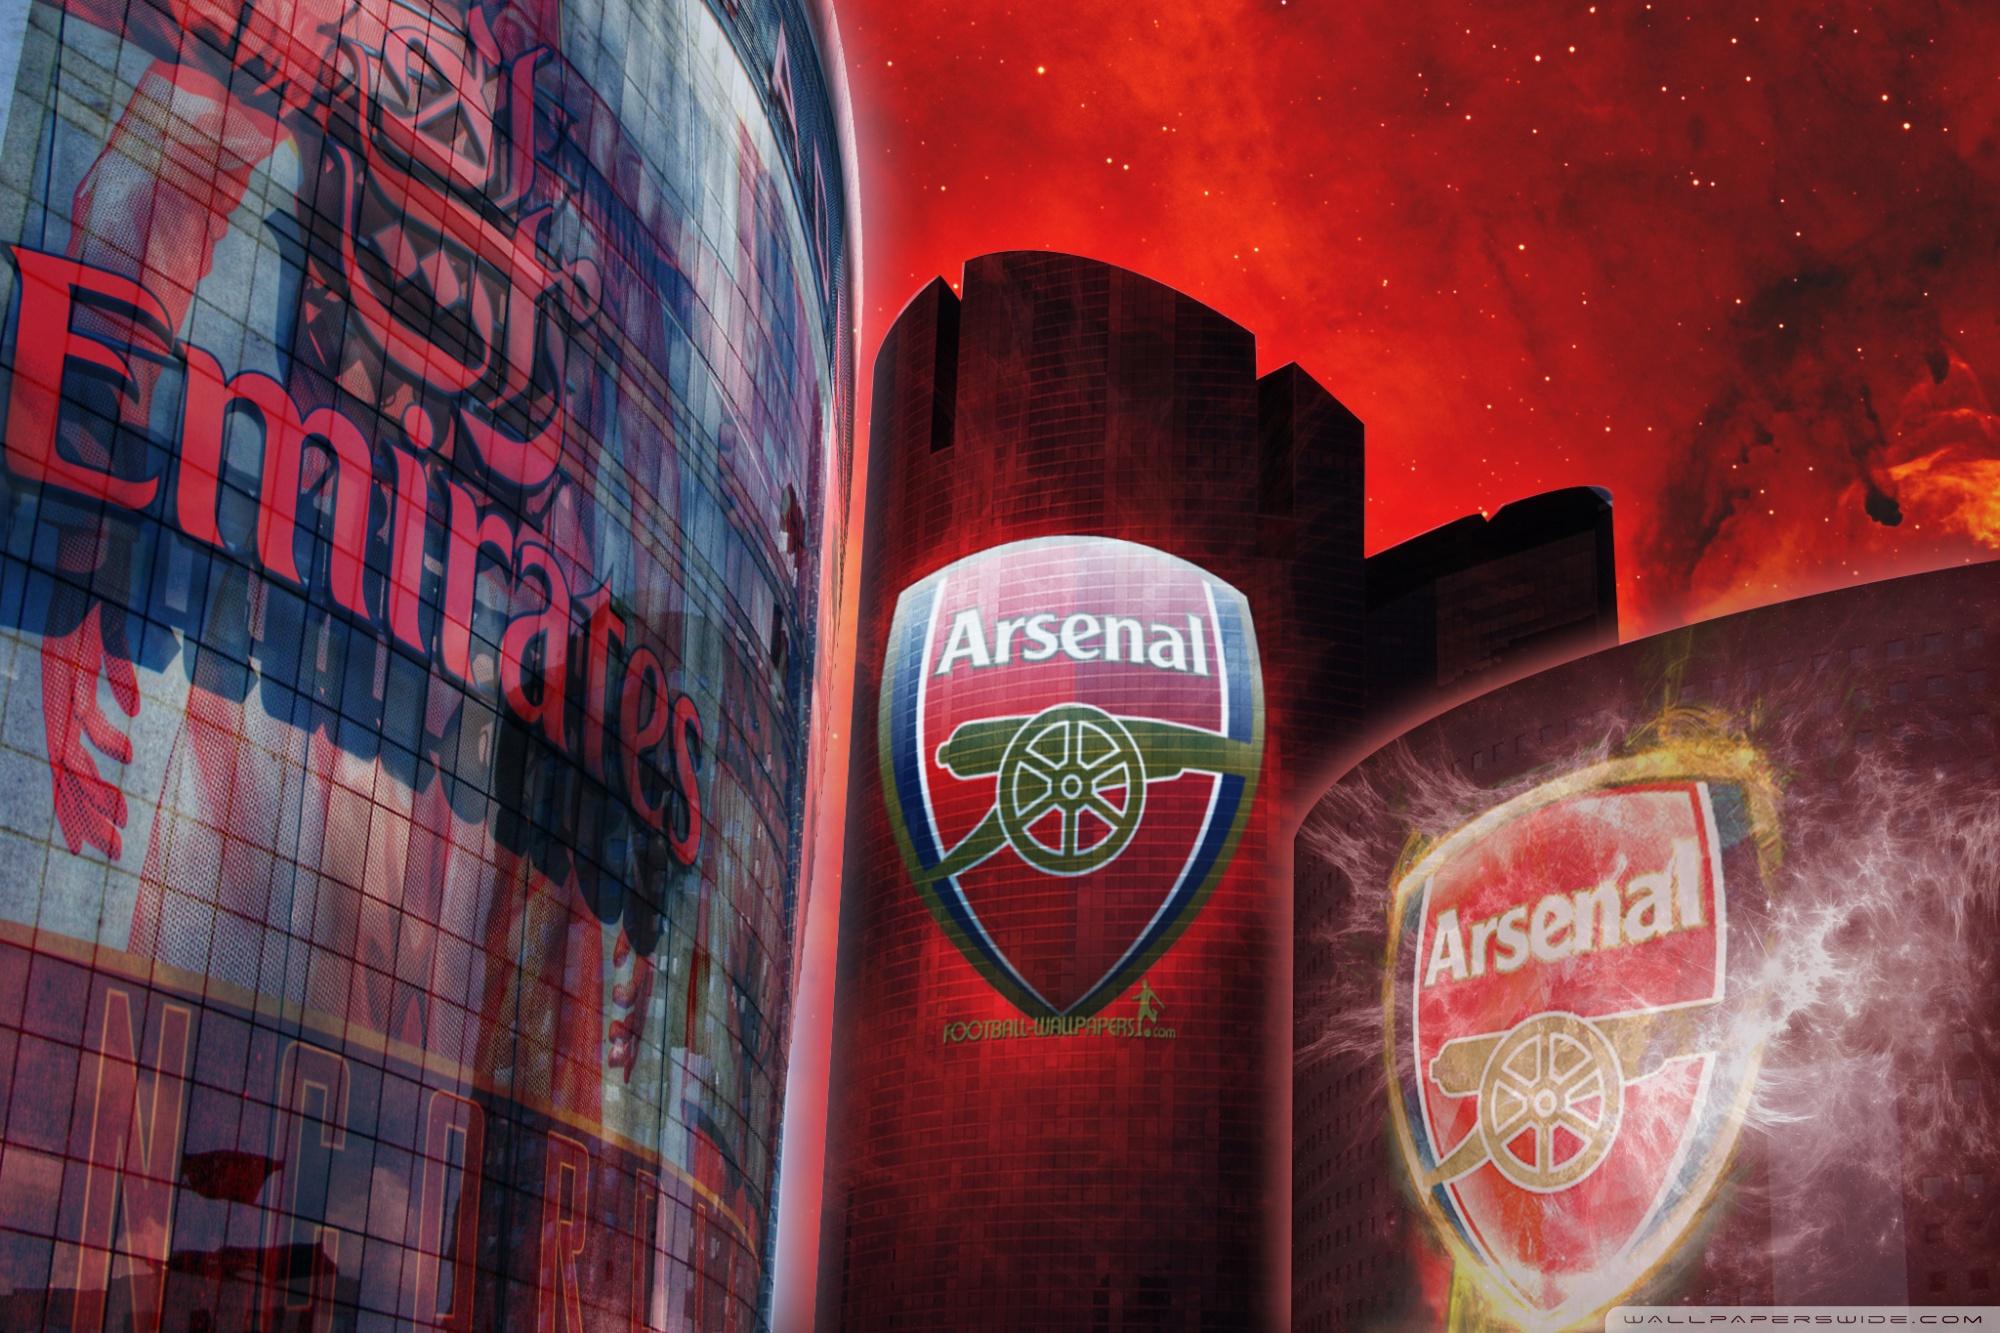 Arsenal Fc Wallpaper 2048 X 1152 , HD Wallpaper & Backgrounds